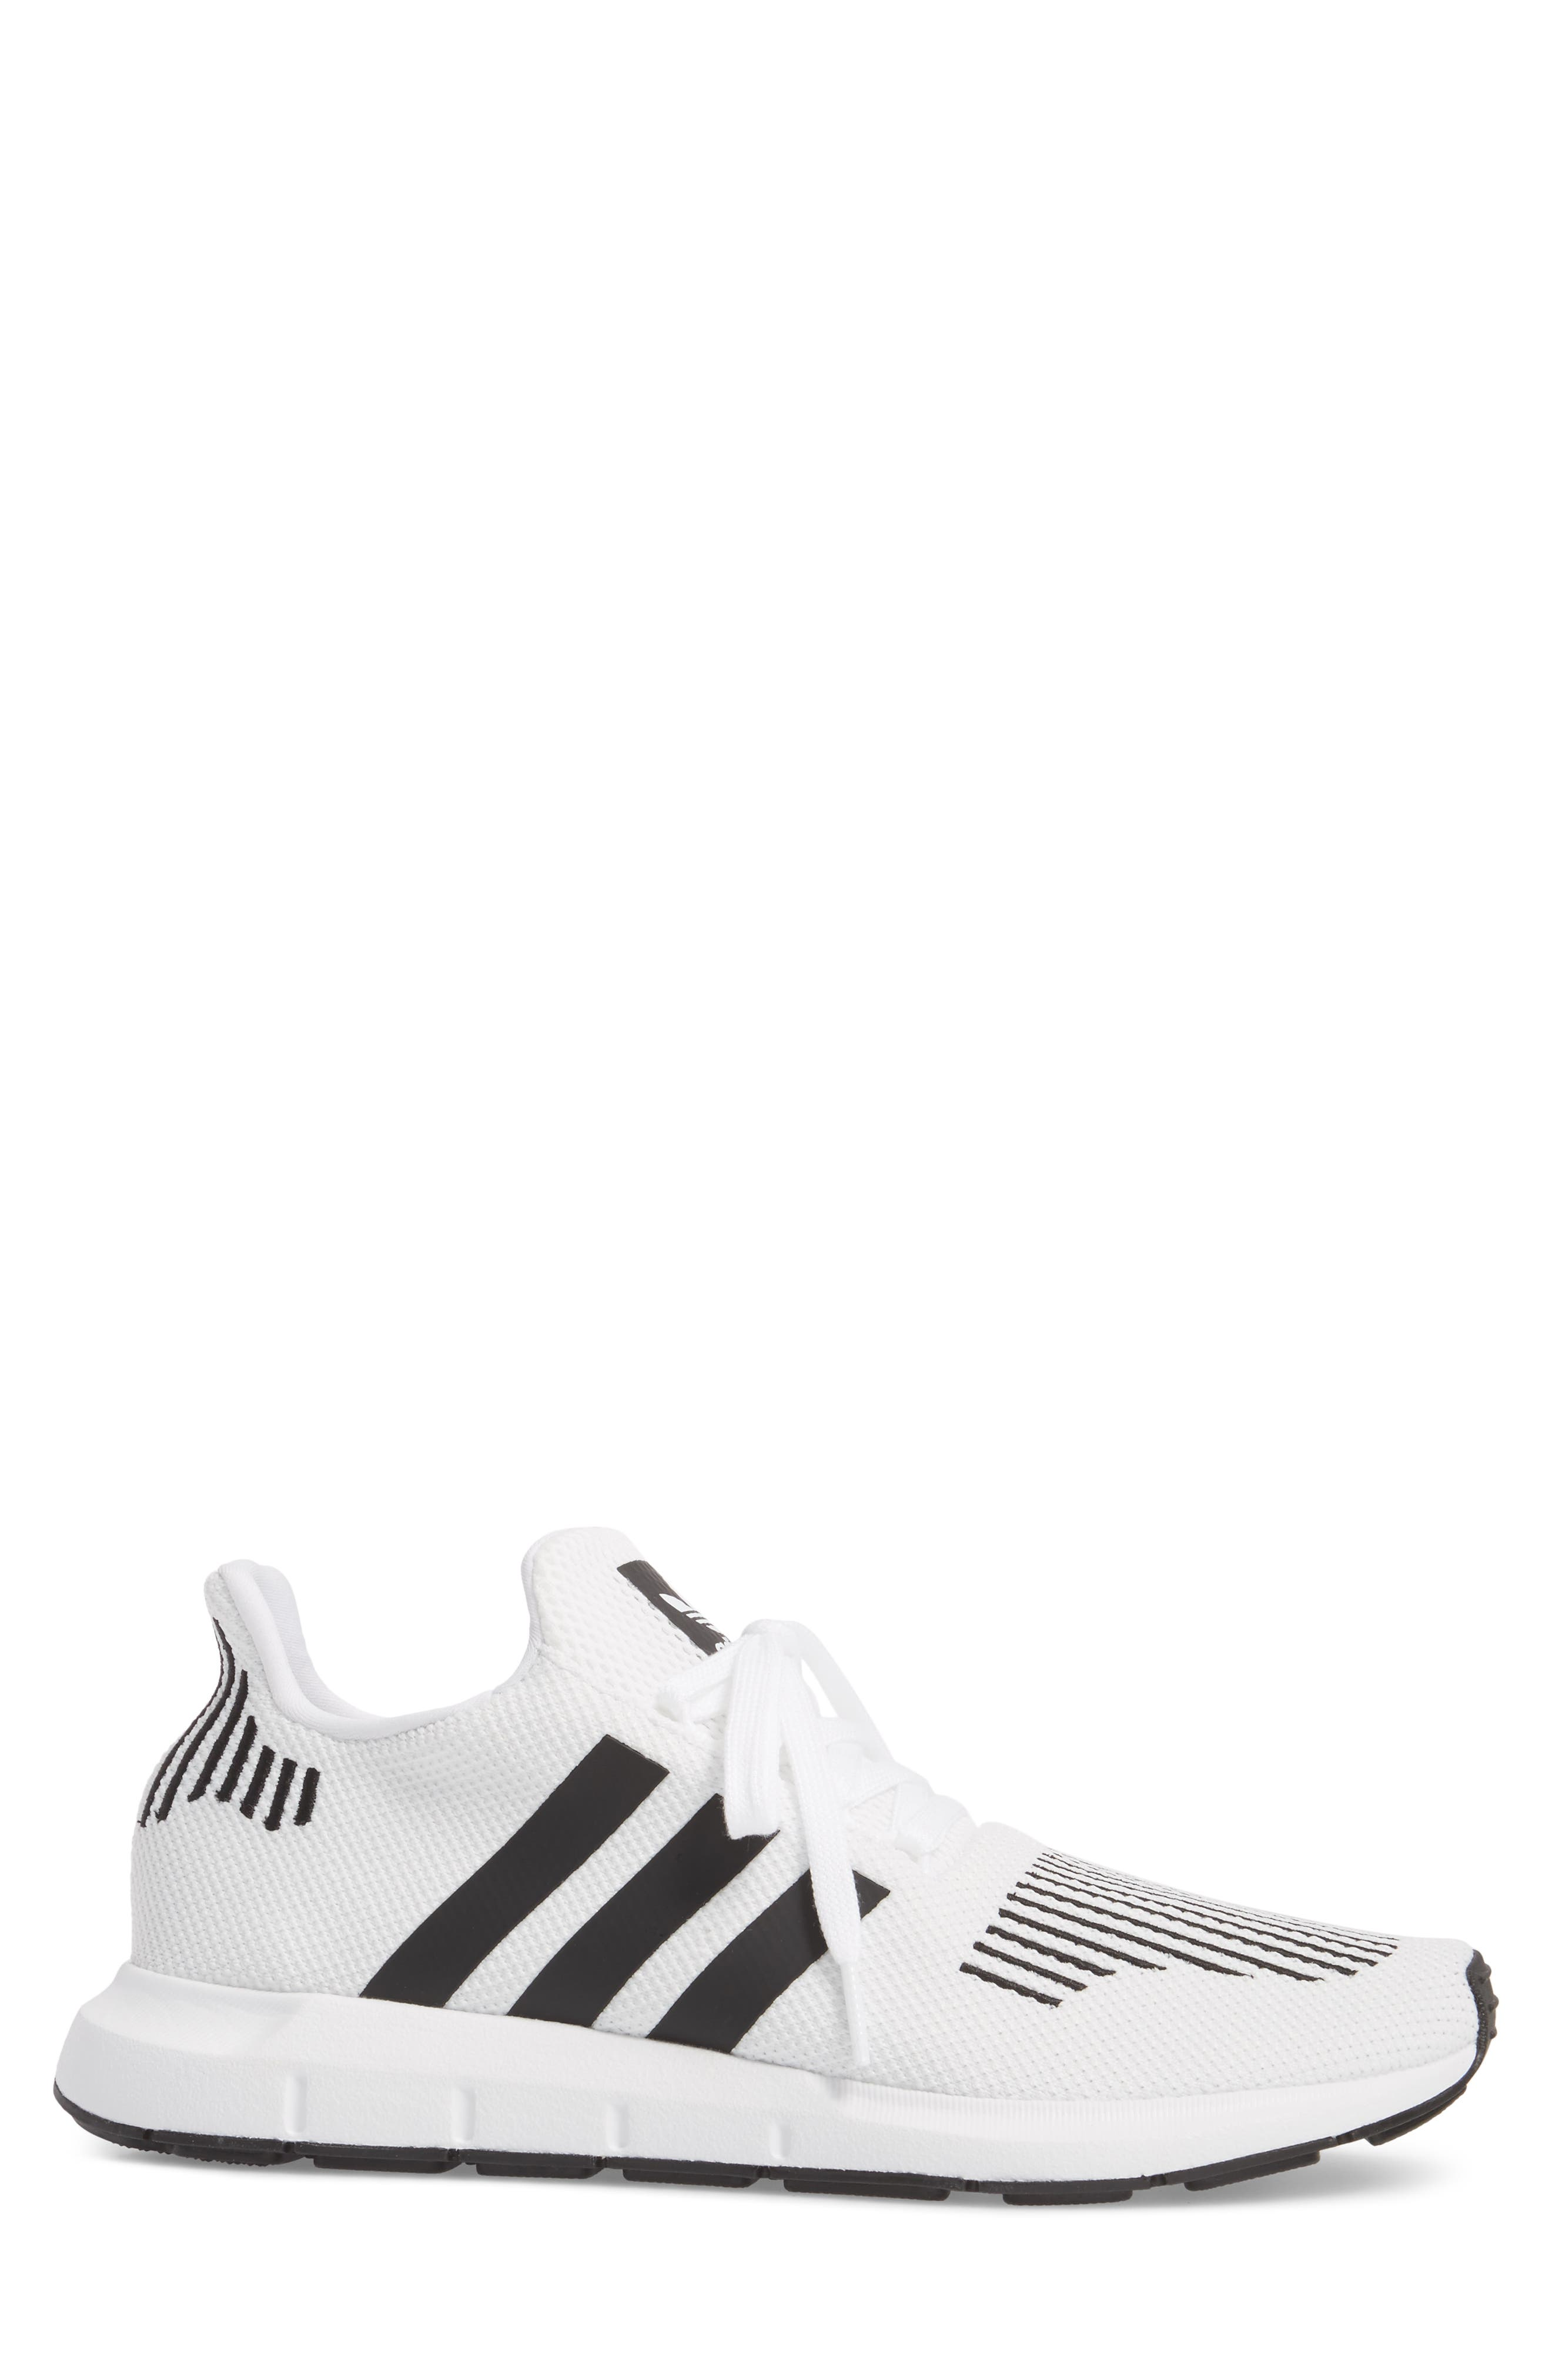 Swift Run Sneaker,                             Alternate thumbnail 3, color,                             White/ Core Black/ Grey